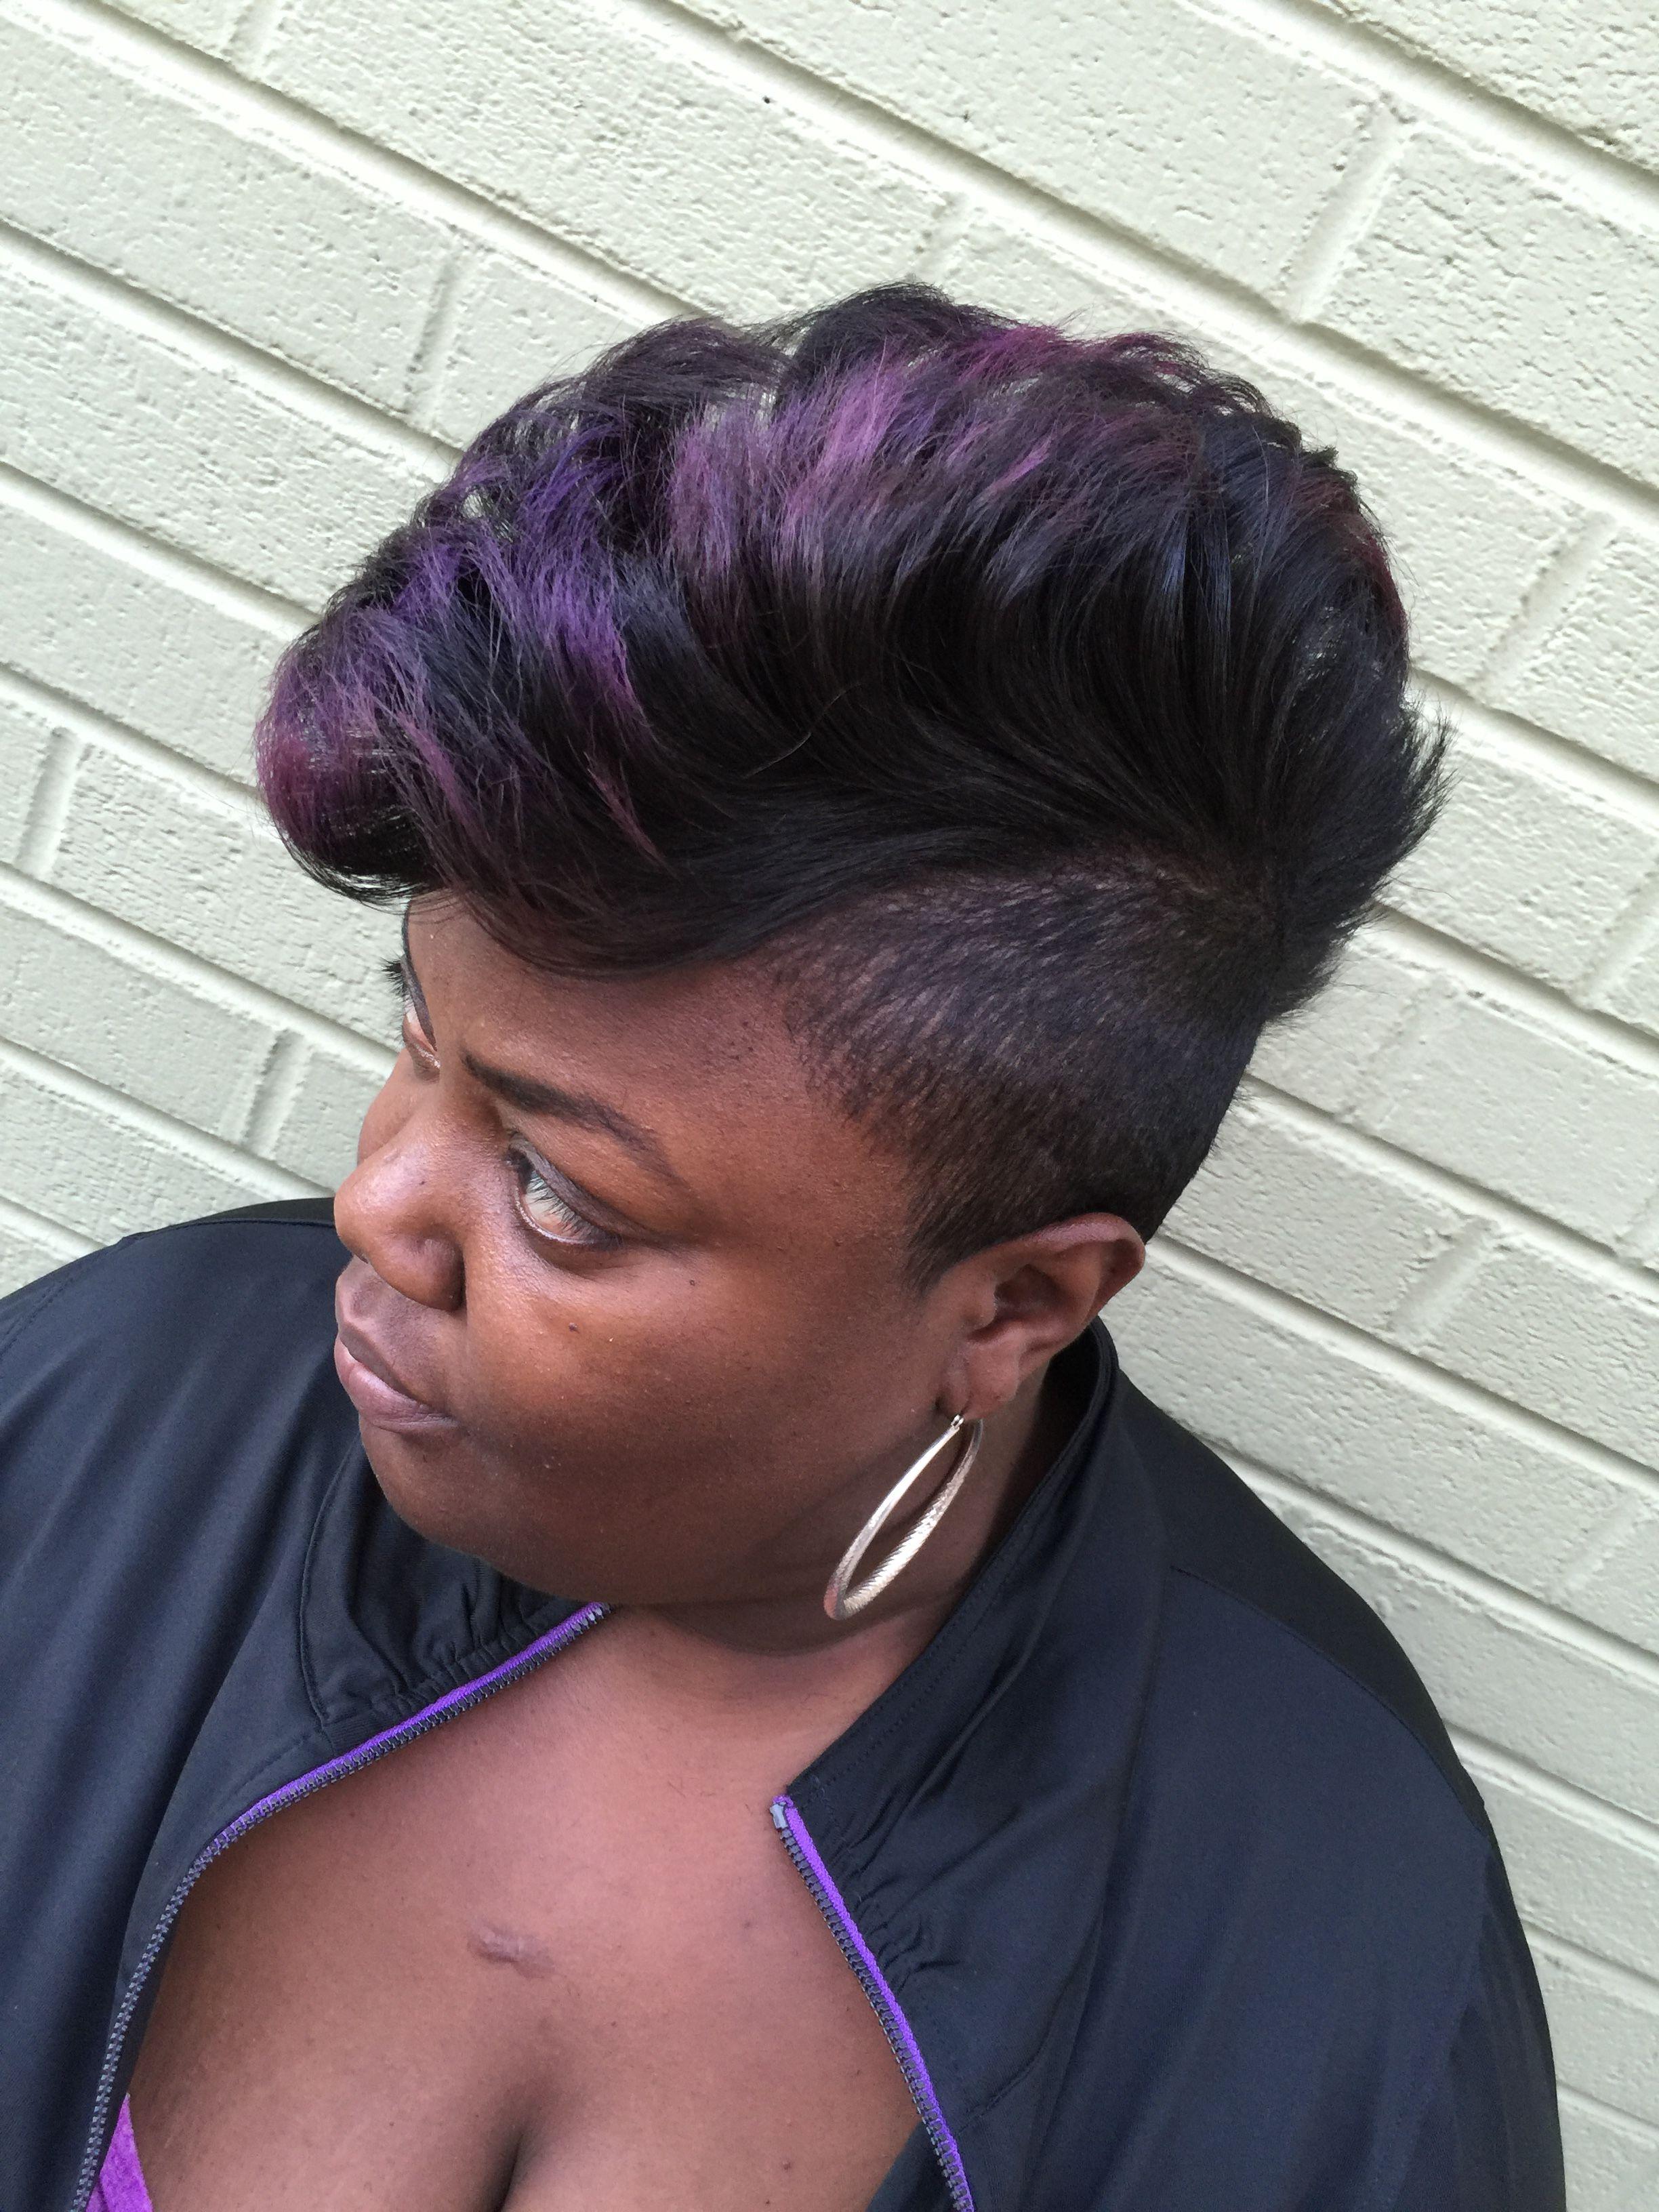 Relaxer Free Hair Stylist Marketia Le Loft Llc Hair Salon